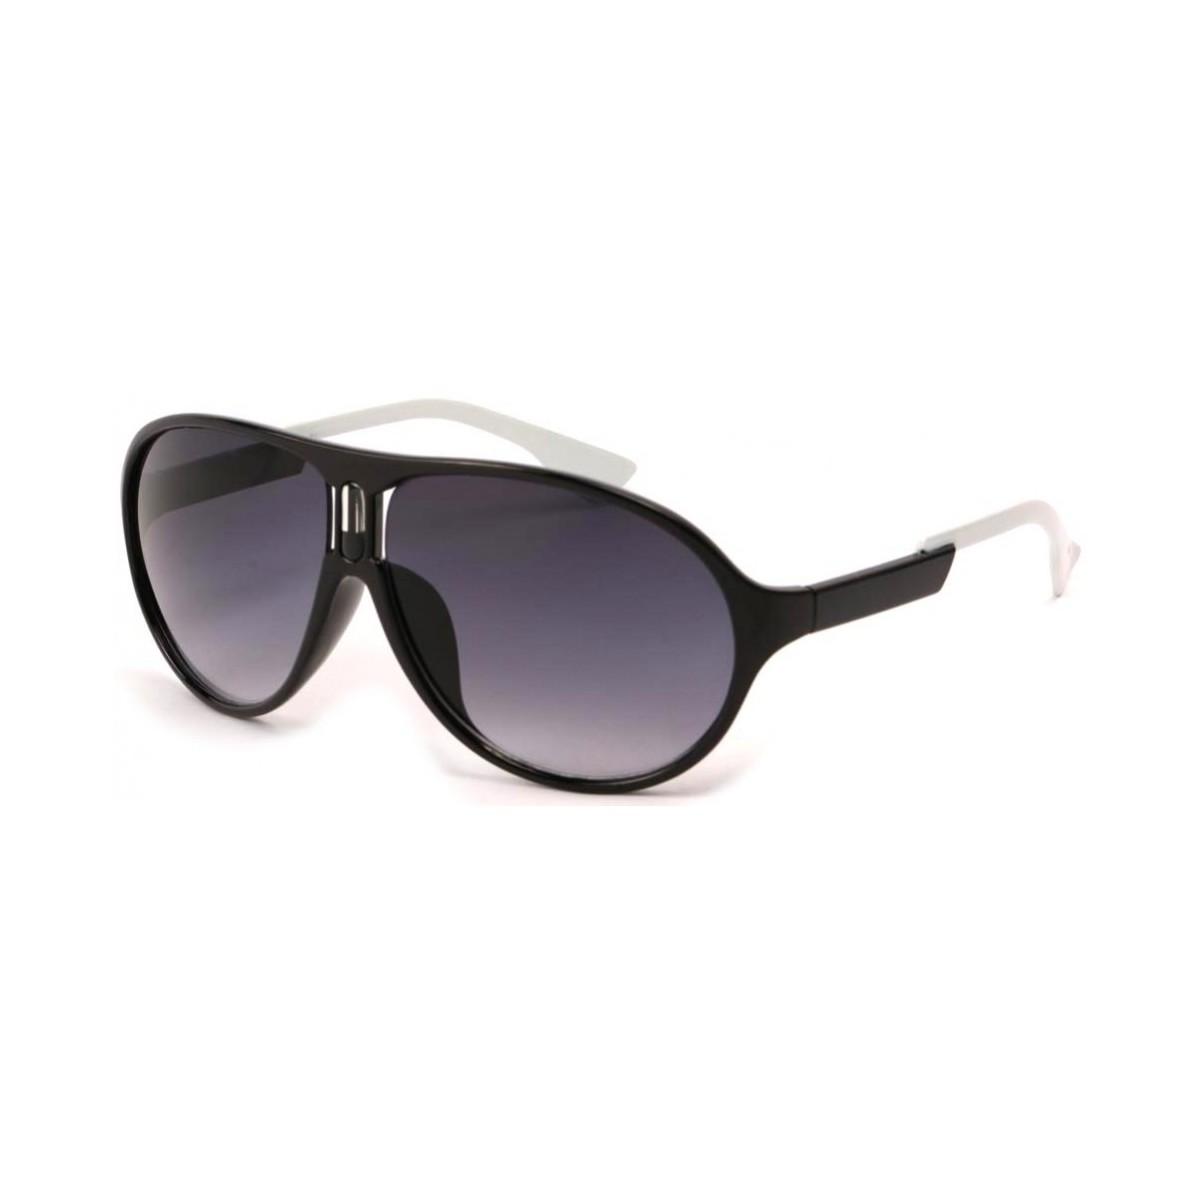 Eye Wear Lunettes Soleil Gaga avec monture Noire Noir